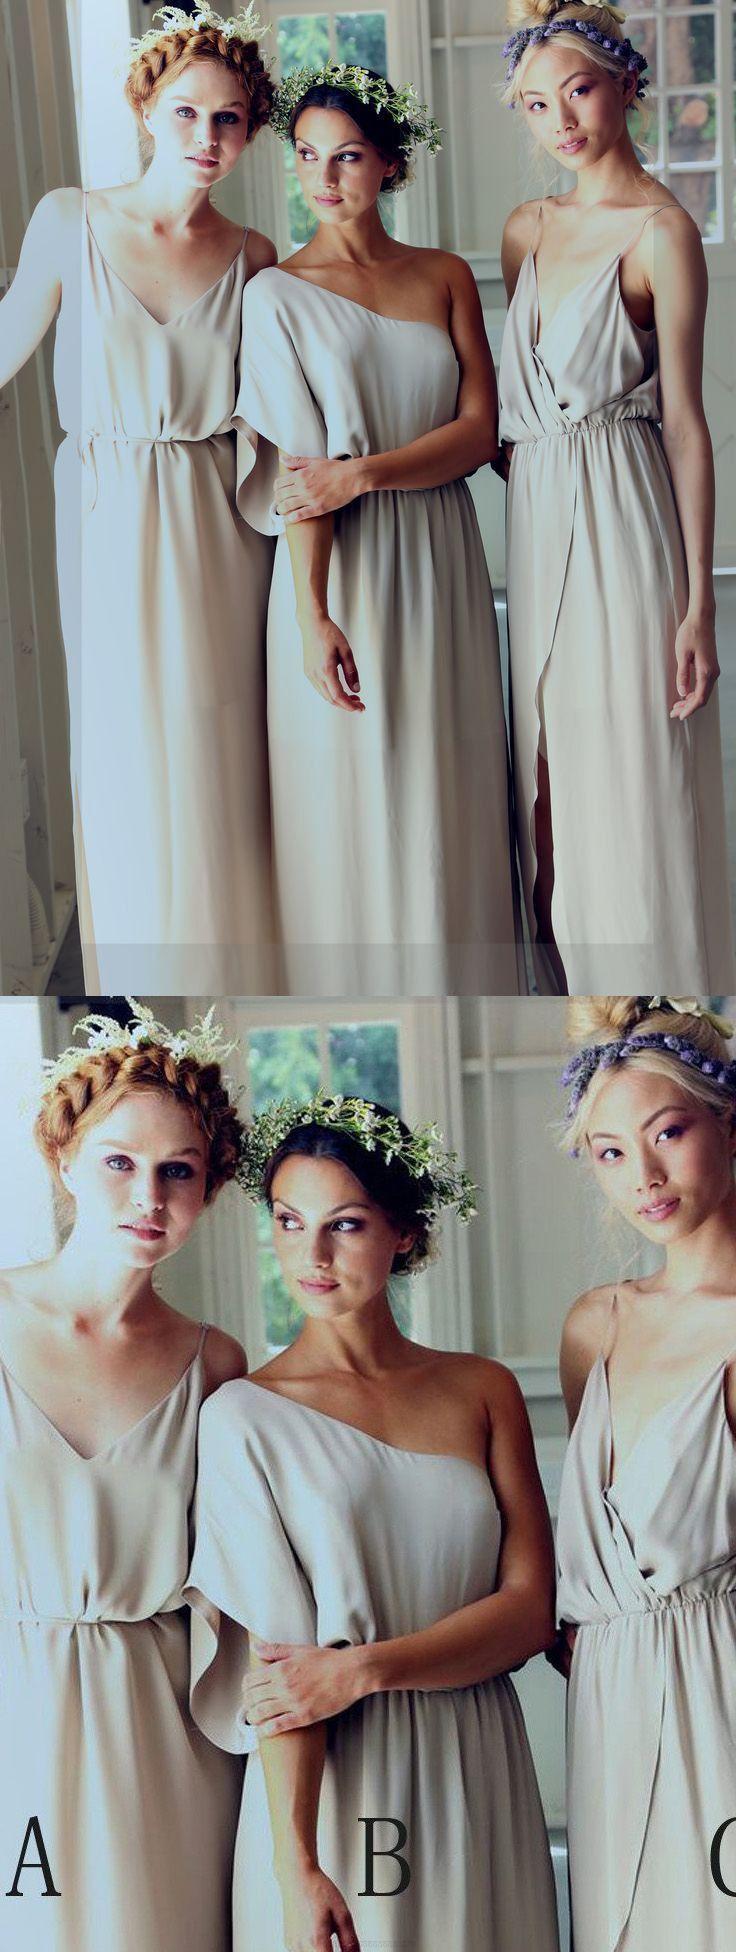 Best 25 cheap bridesmaid dresses online ideas on pinterest bridesmaid dresses online one shoulder bridesmaid dresses bridesmaid dresses cheap long grey bridesmaid ombrellifo Gallery